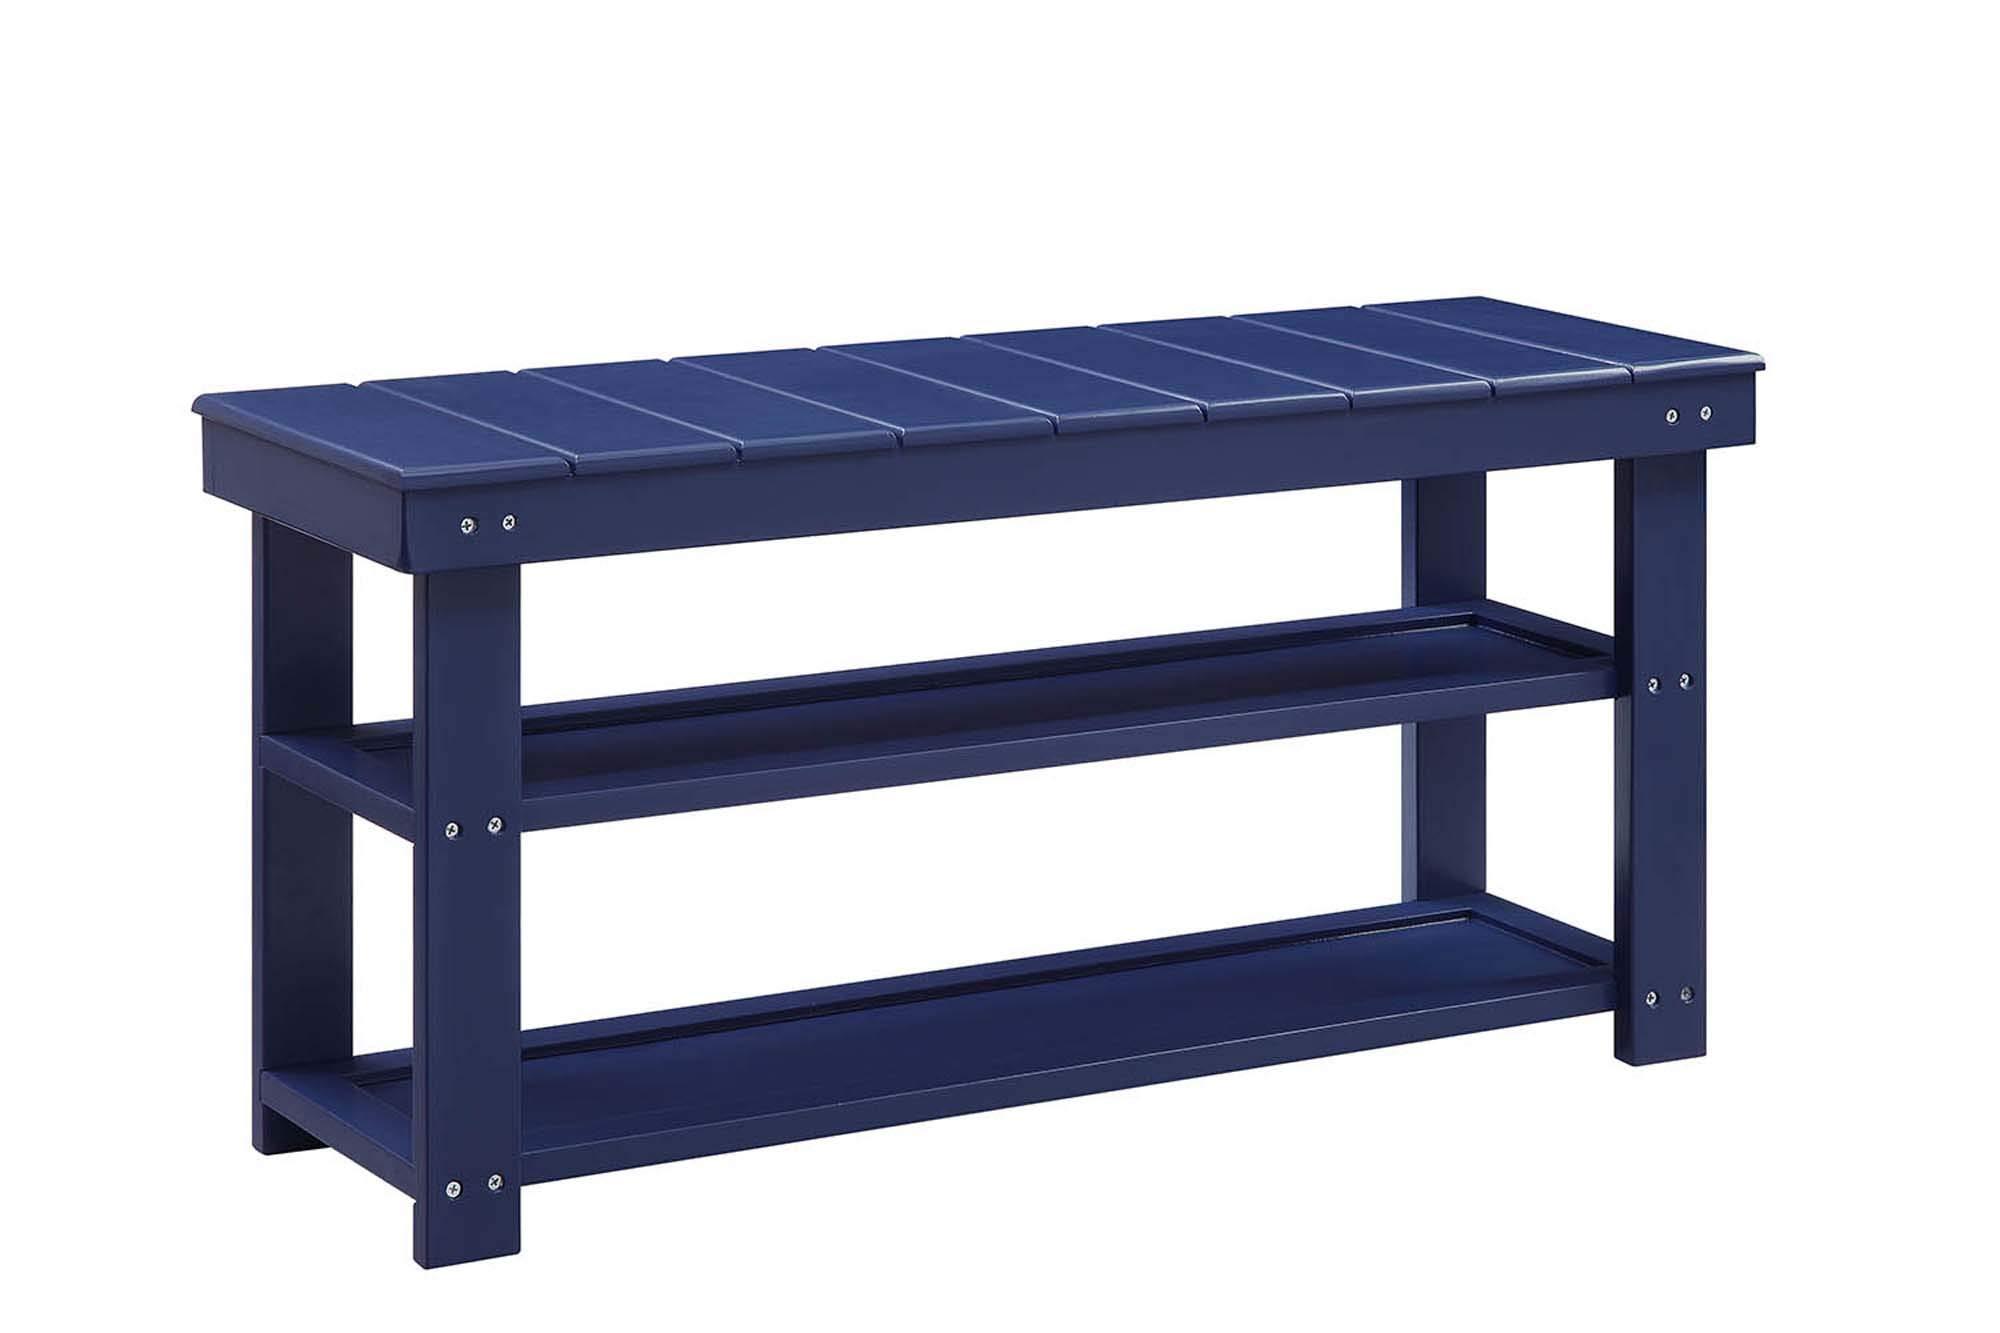 Convenience Concepts 203300CBE Oxford Utility Mudroom Bench, Cobalt Blue